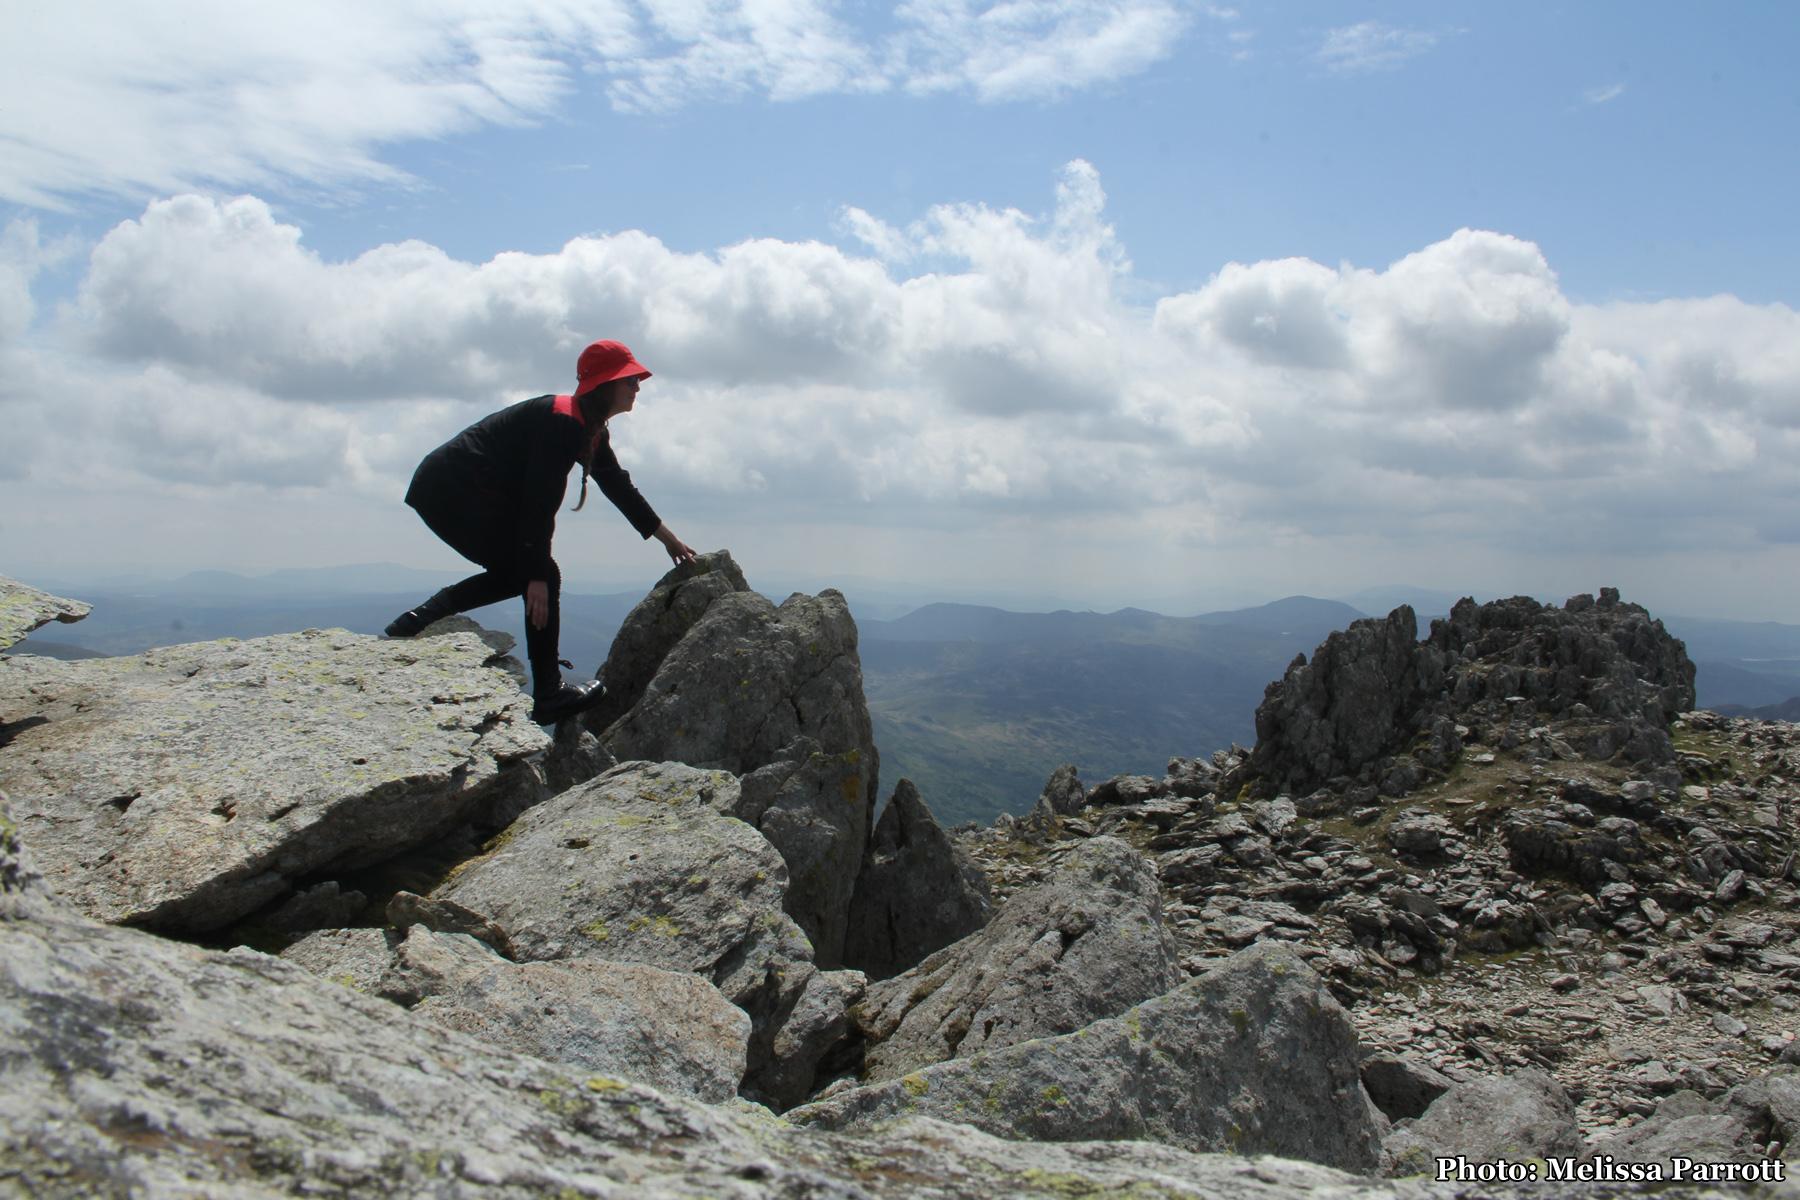 Scrambling hill climber